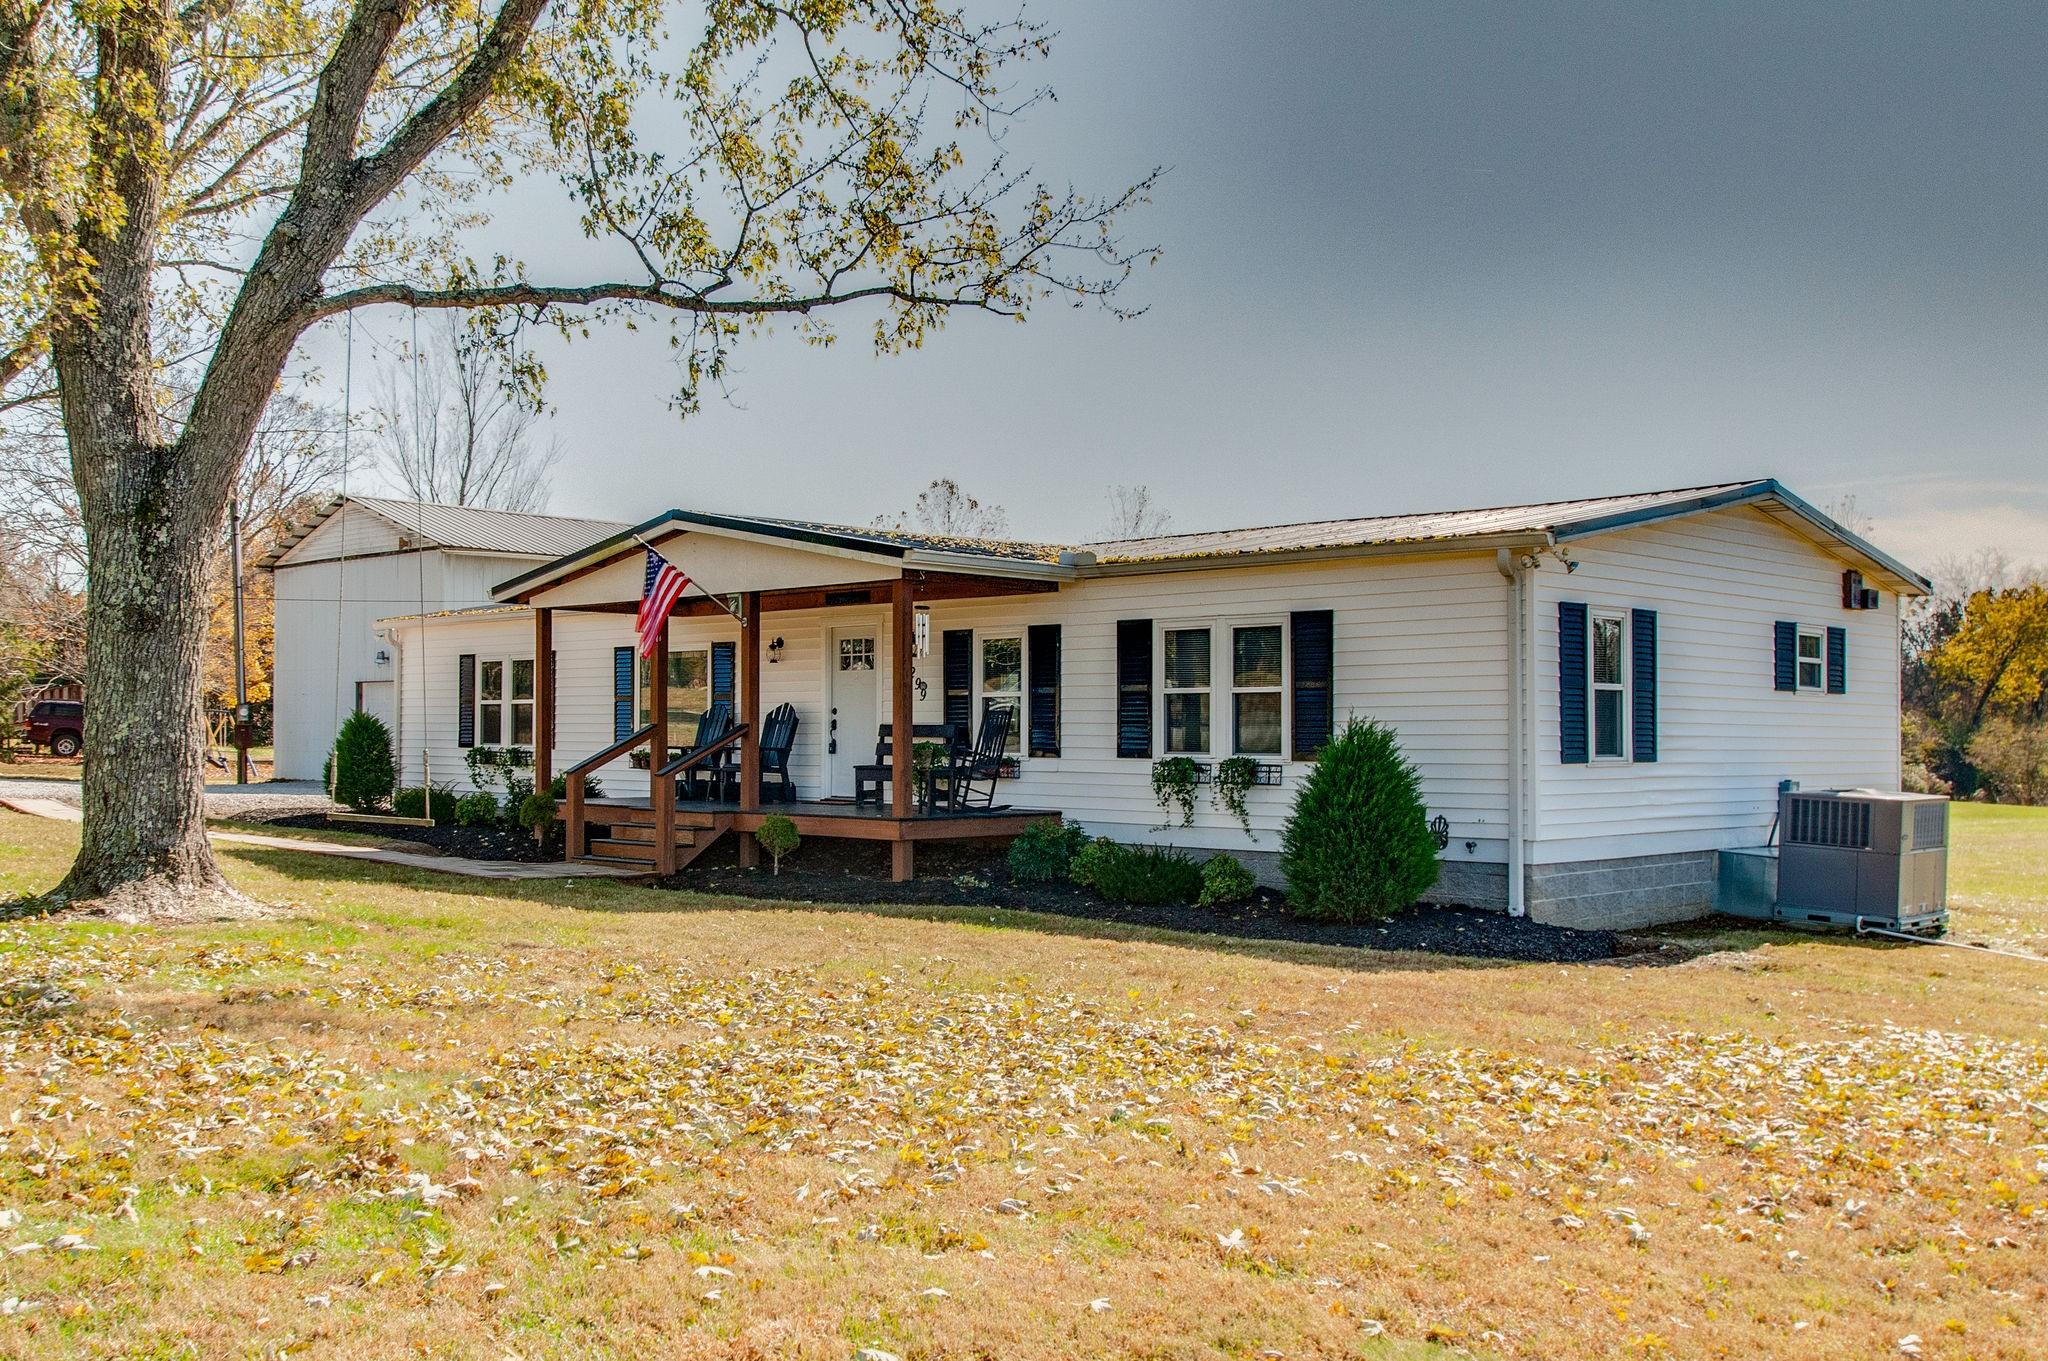 8299 Ellis Dr, Joelton, TN 37080 - Joelton, TN real estate listing